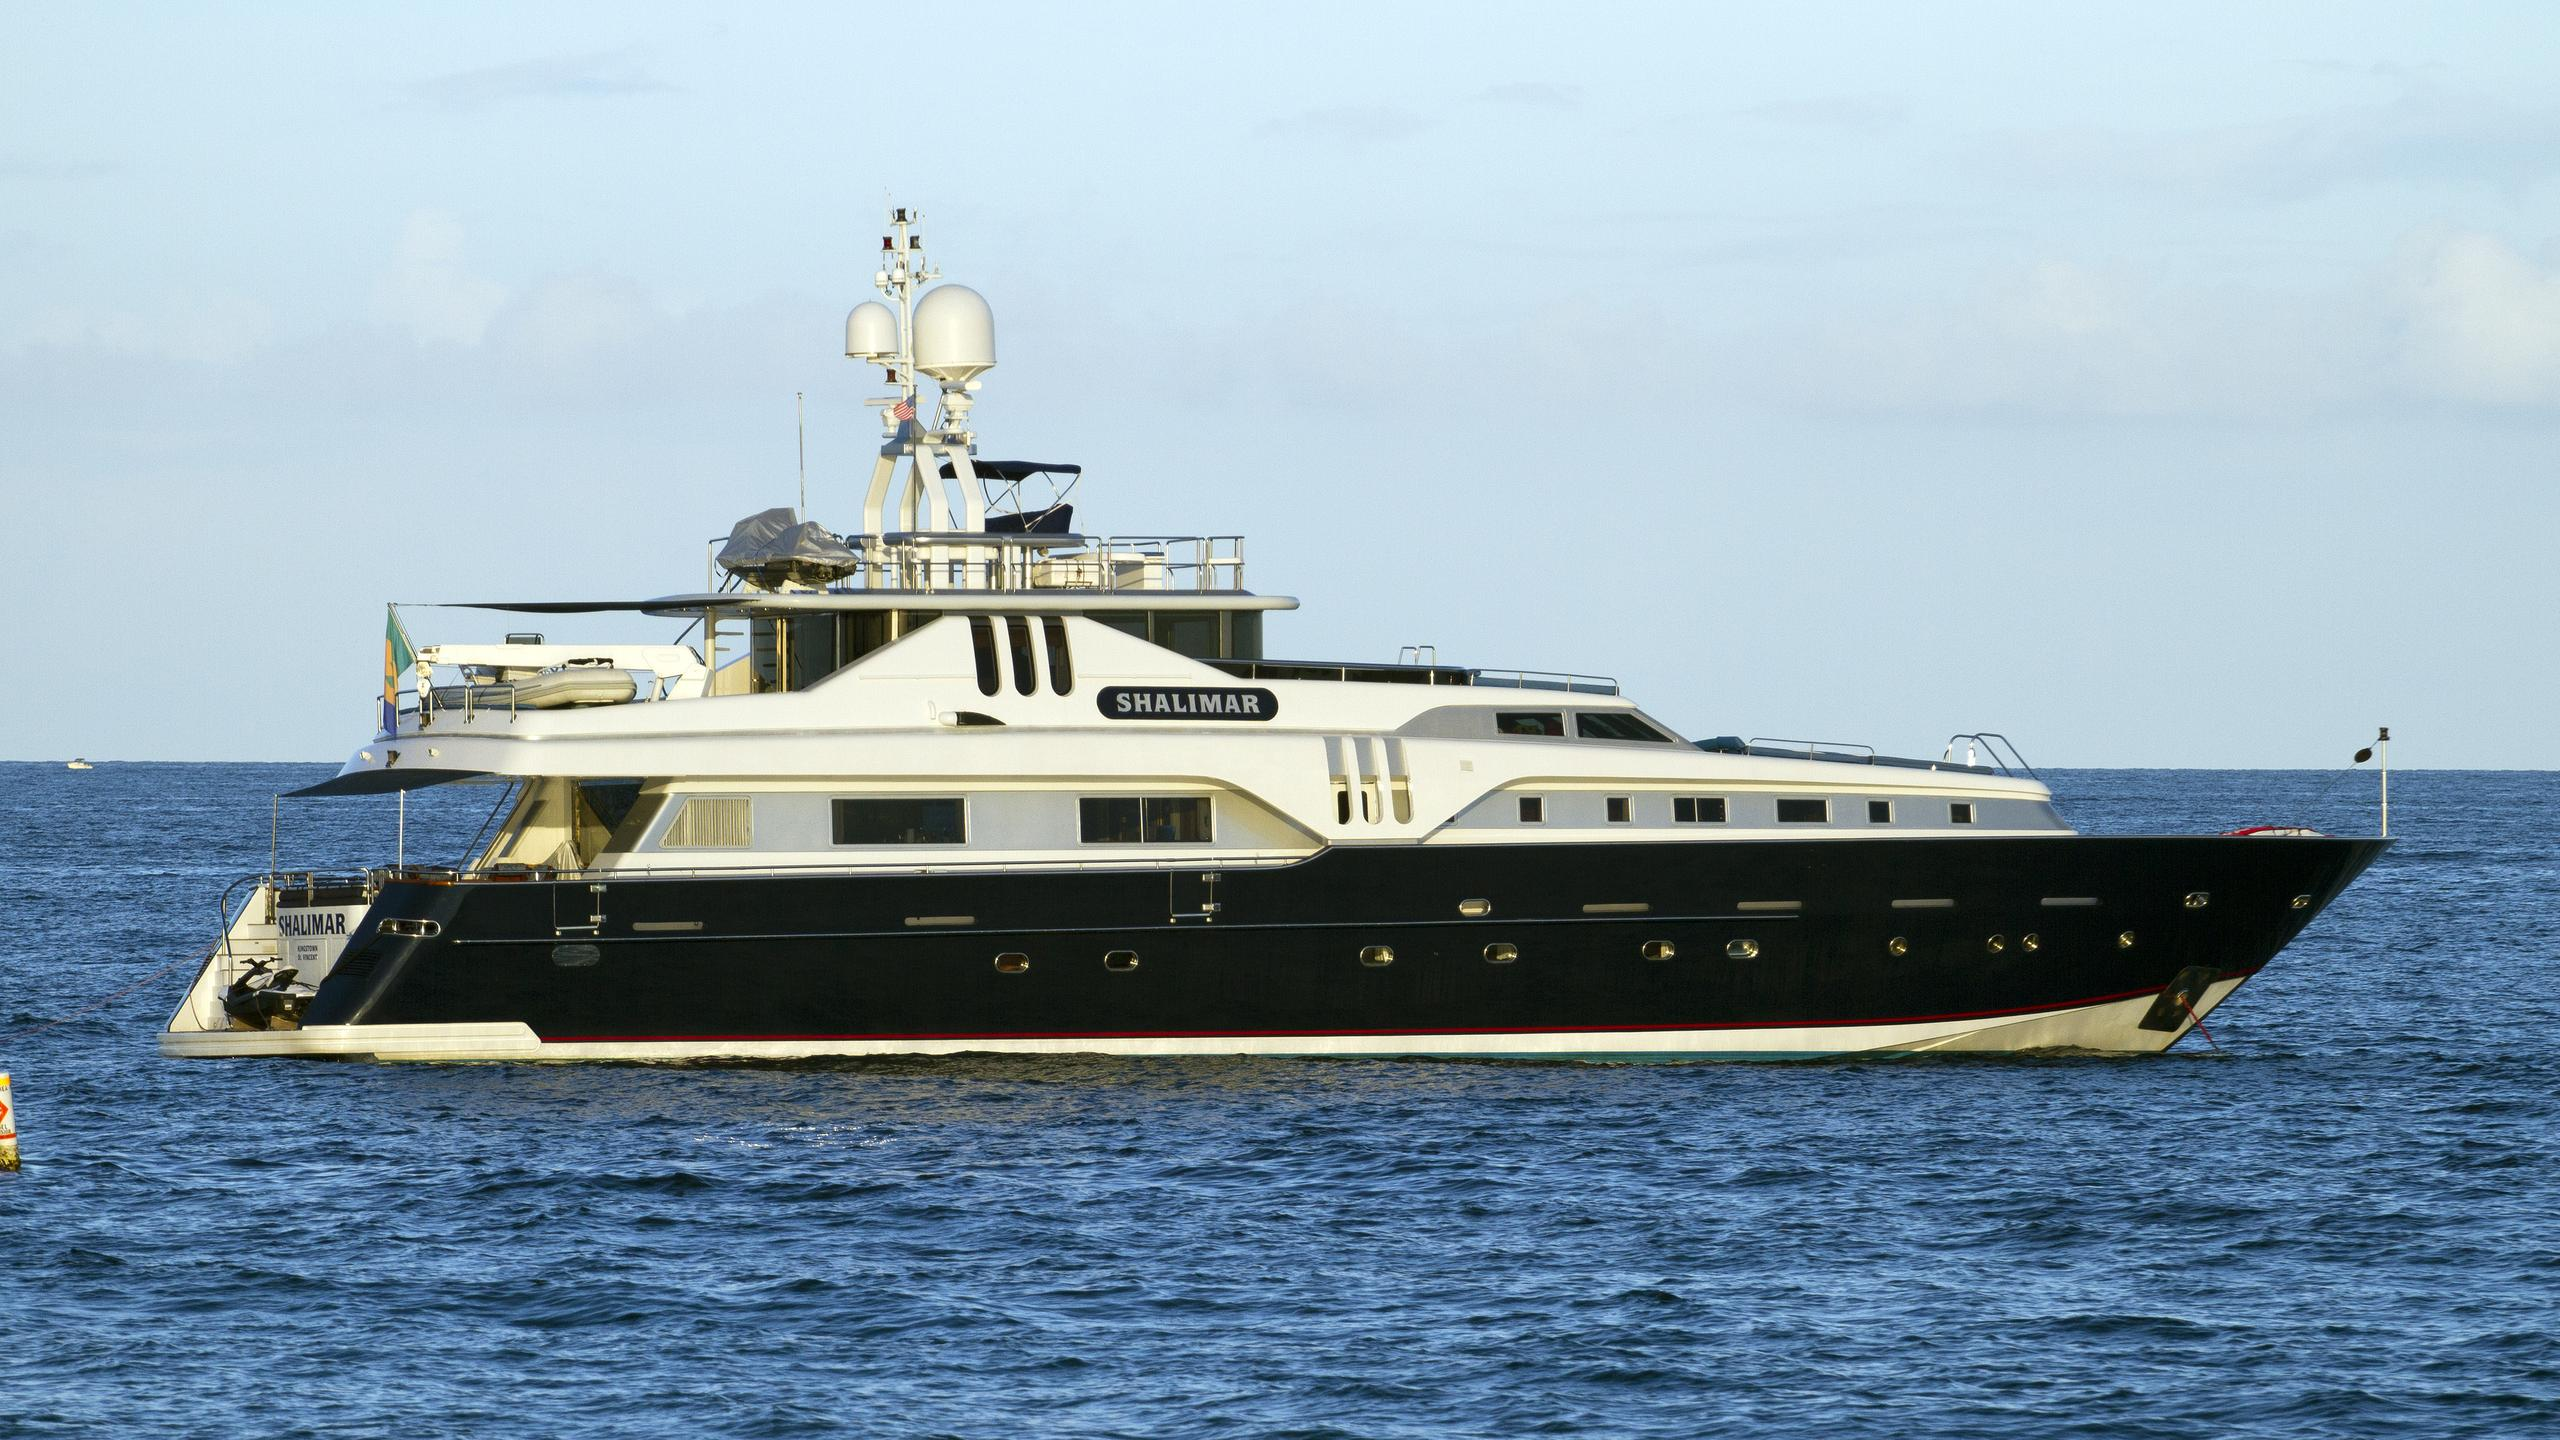 shalimar-motor-yacht-azimut-118-california-1994-37m-profile